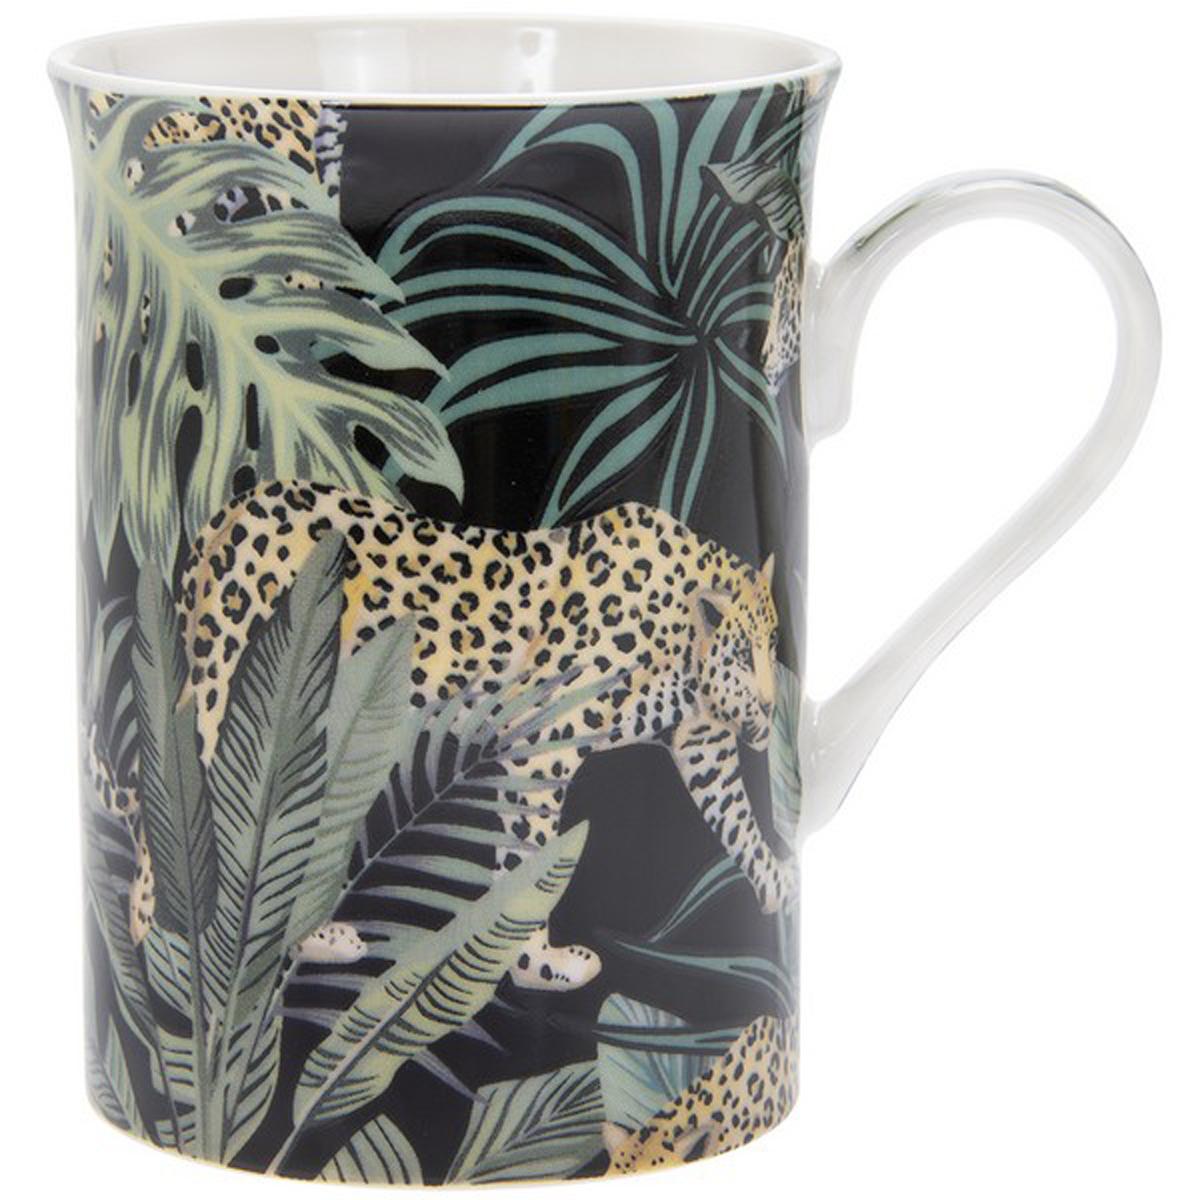 Mug porcelaine \'Jungle Fever\' vert noir - 10x75 cm (léopard) - [R0474]